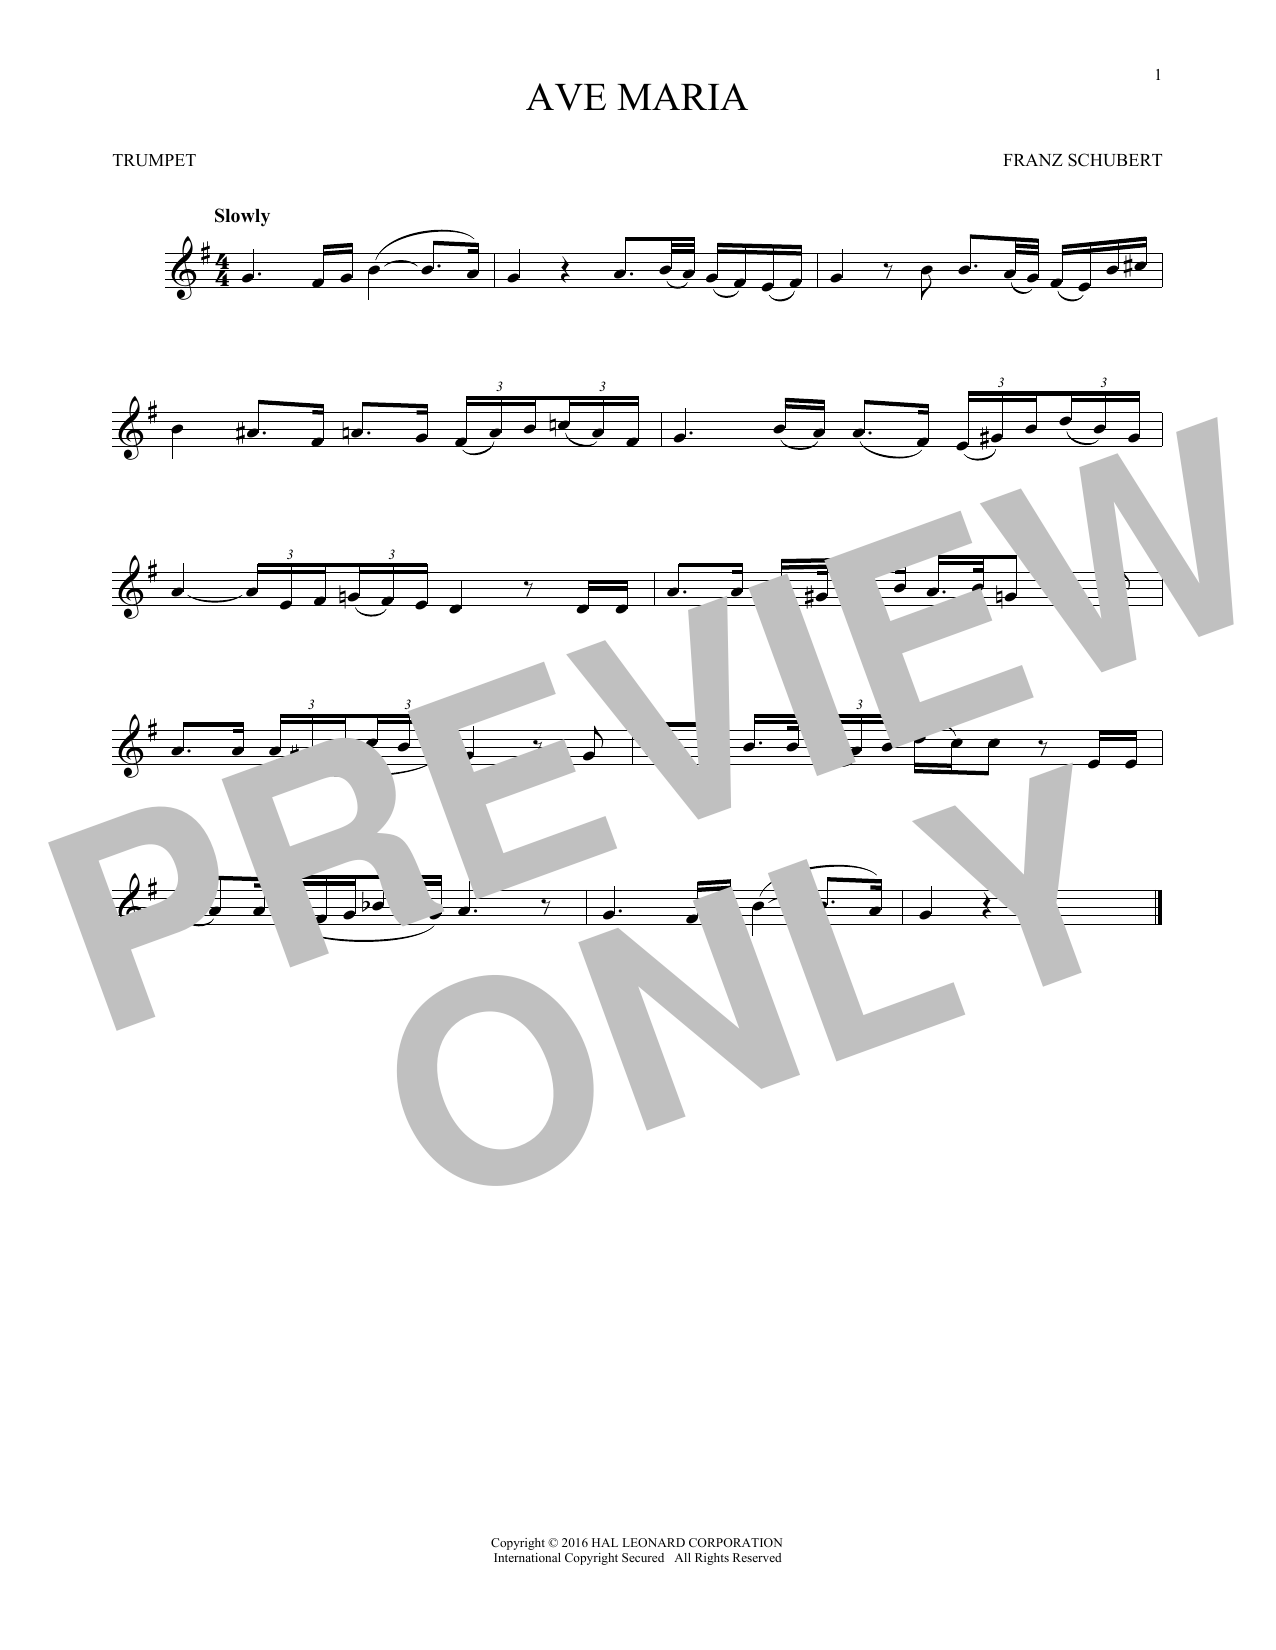 Ave Maria, Op. 52, No. 6 (Trumpet Solo)